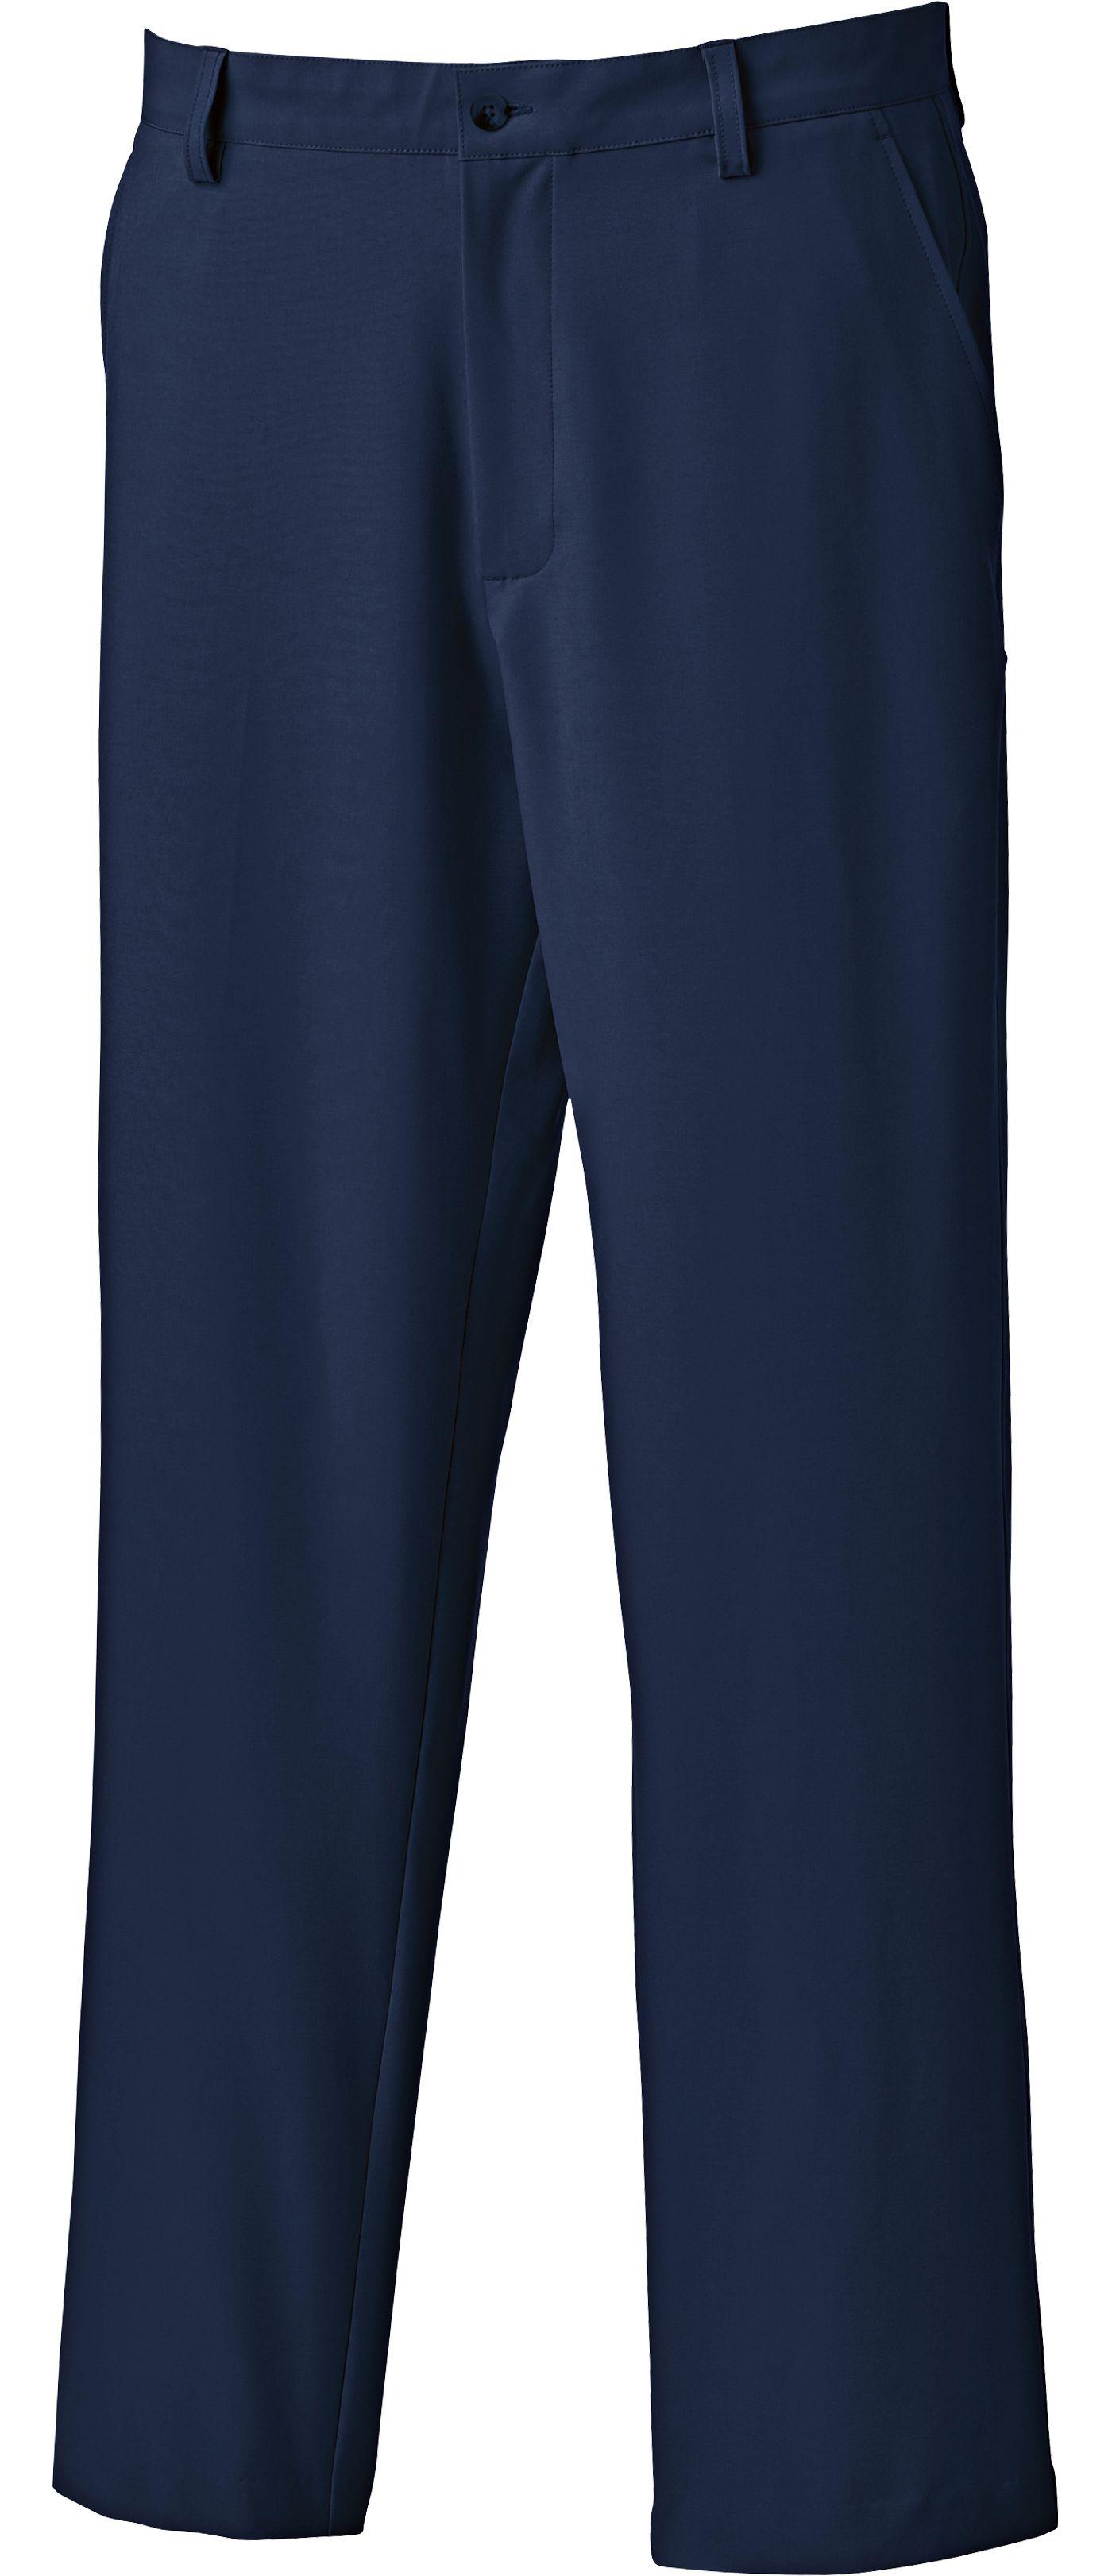 FootJoy Men's Performance Golf Pants